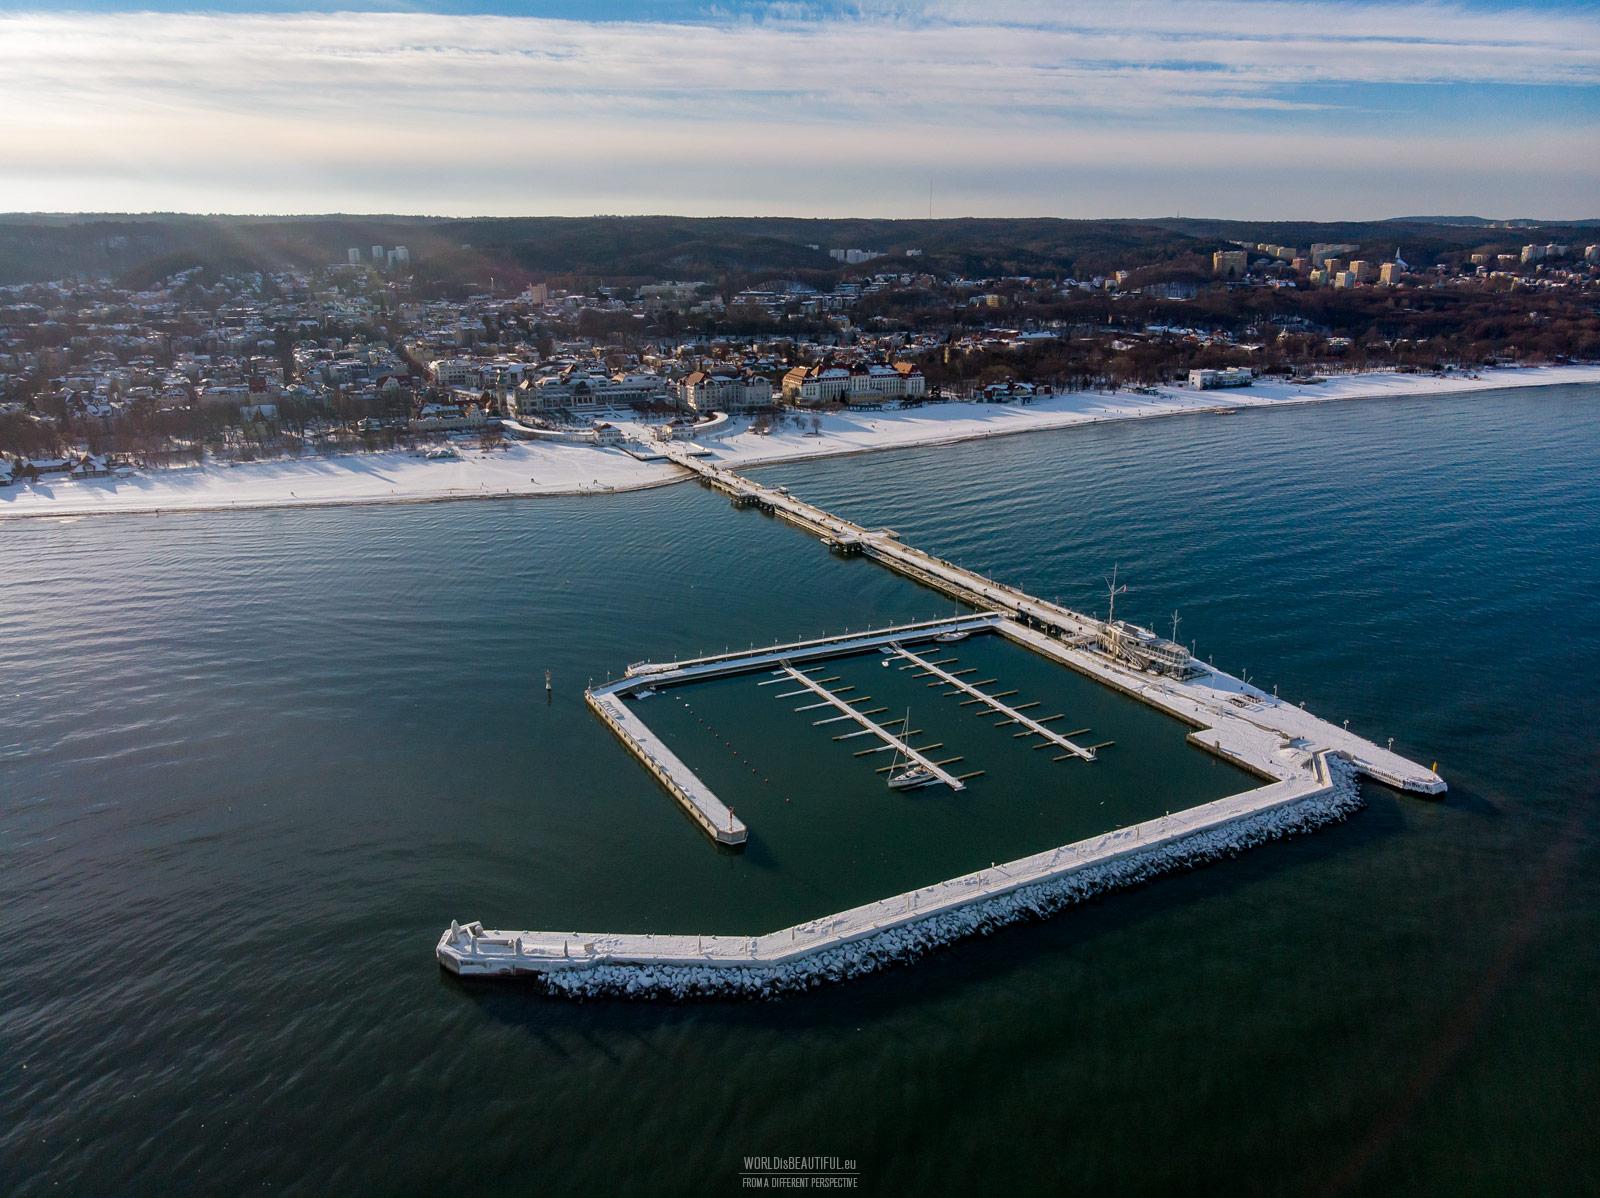 Pier in Sopot, winter photo